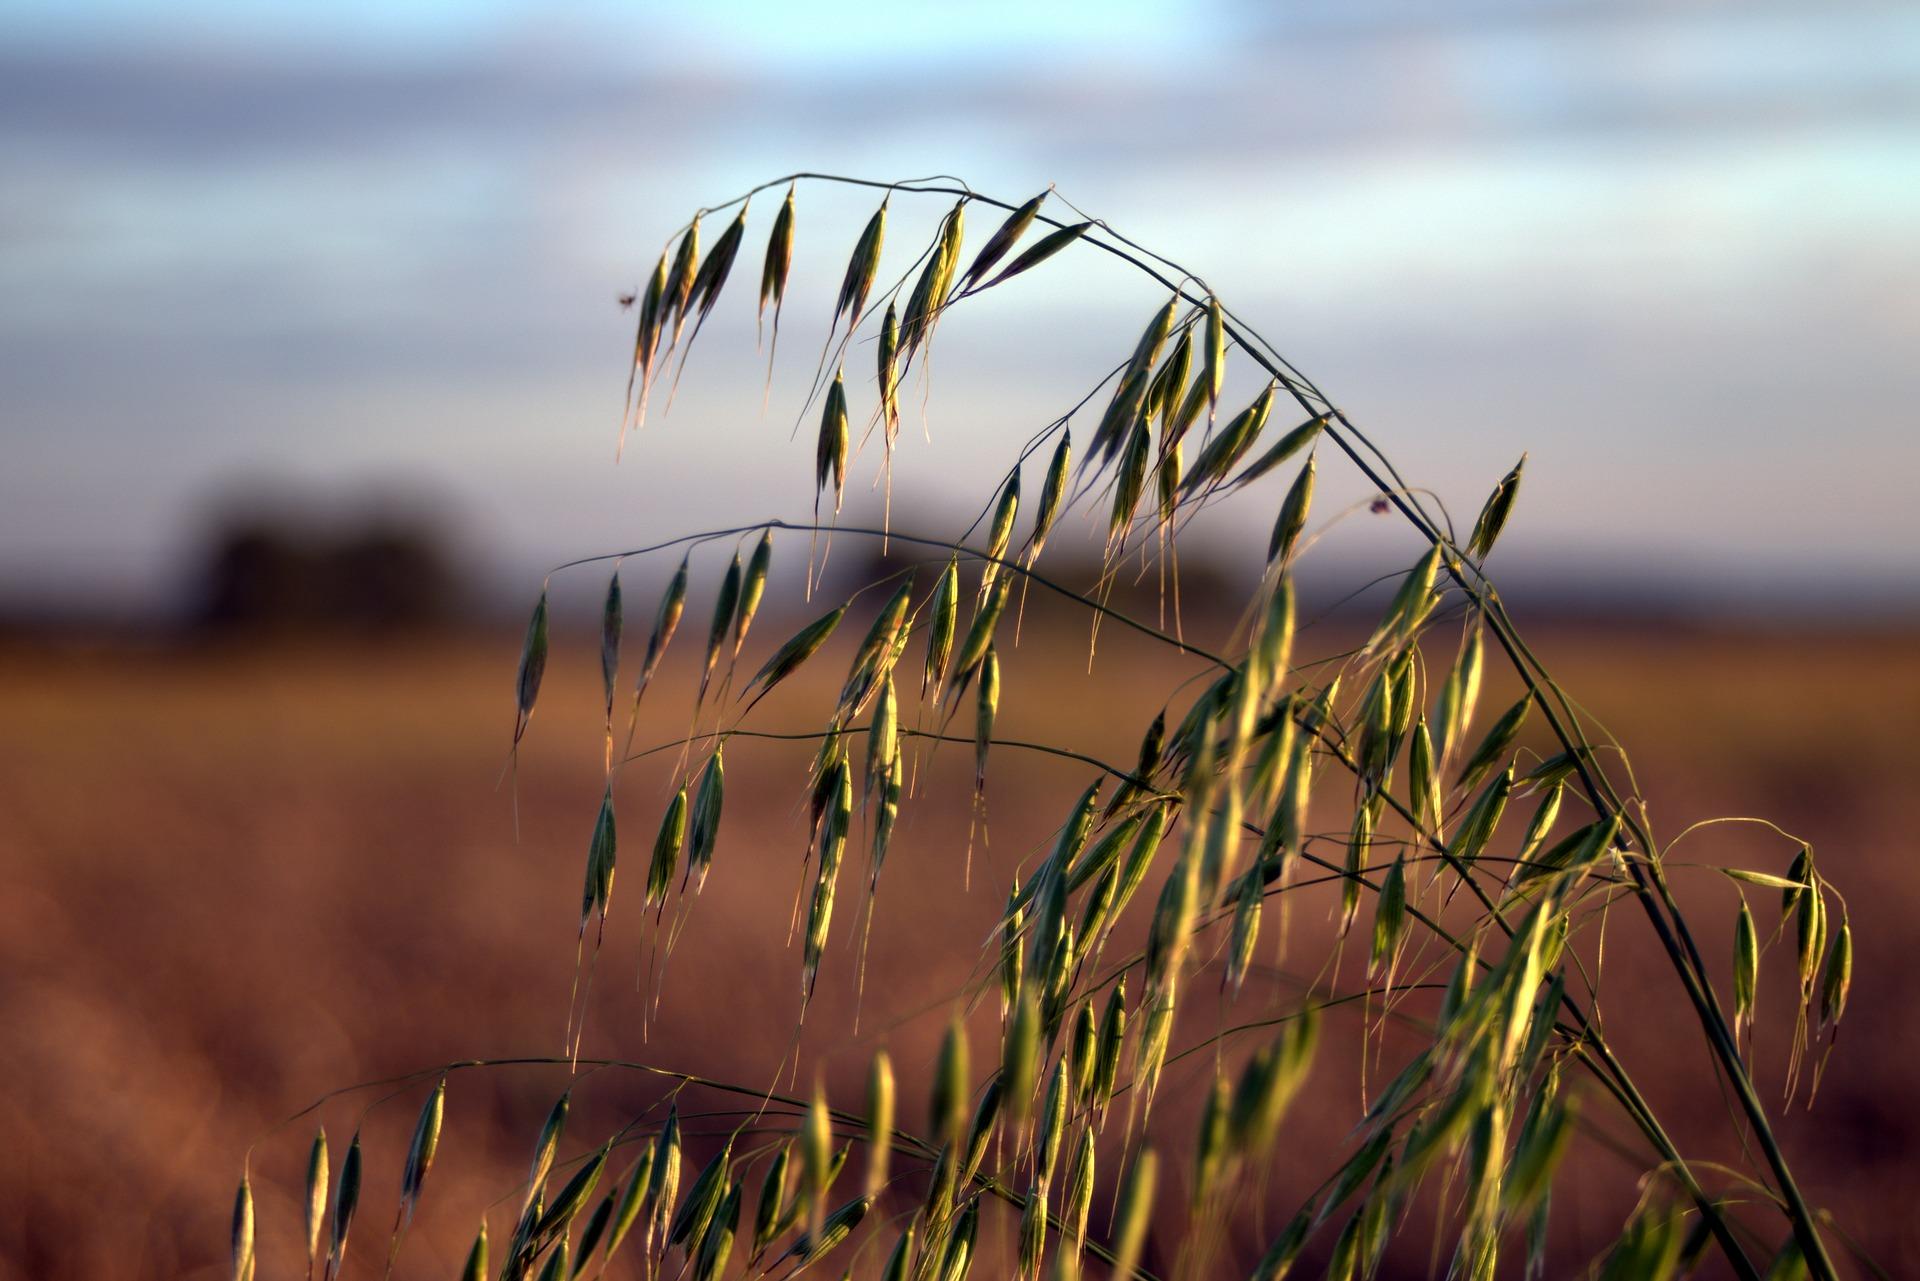 oats-1534513_1920.jpg